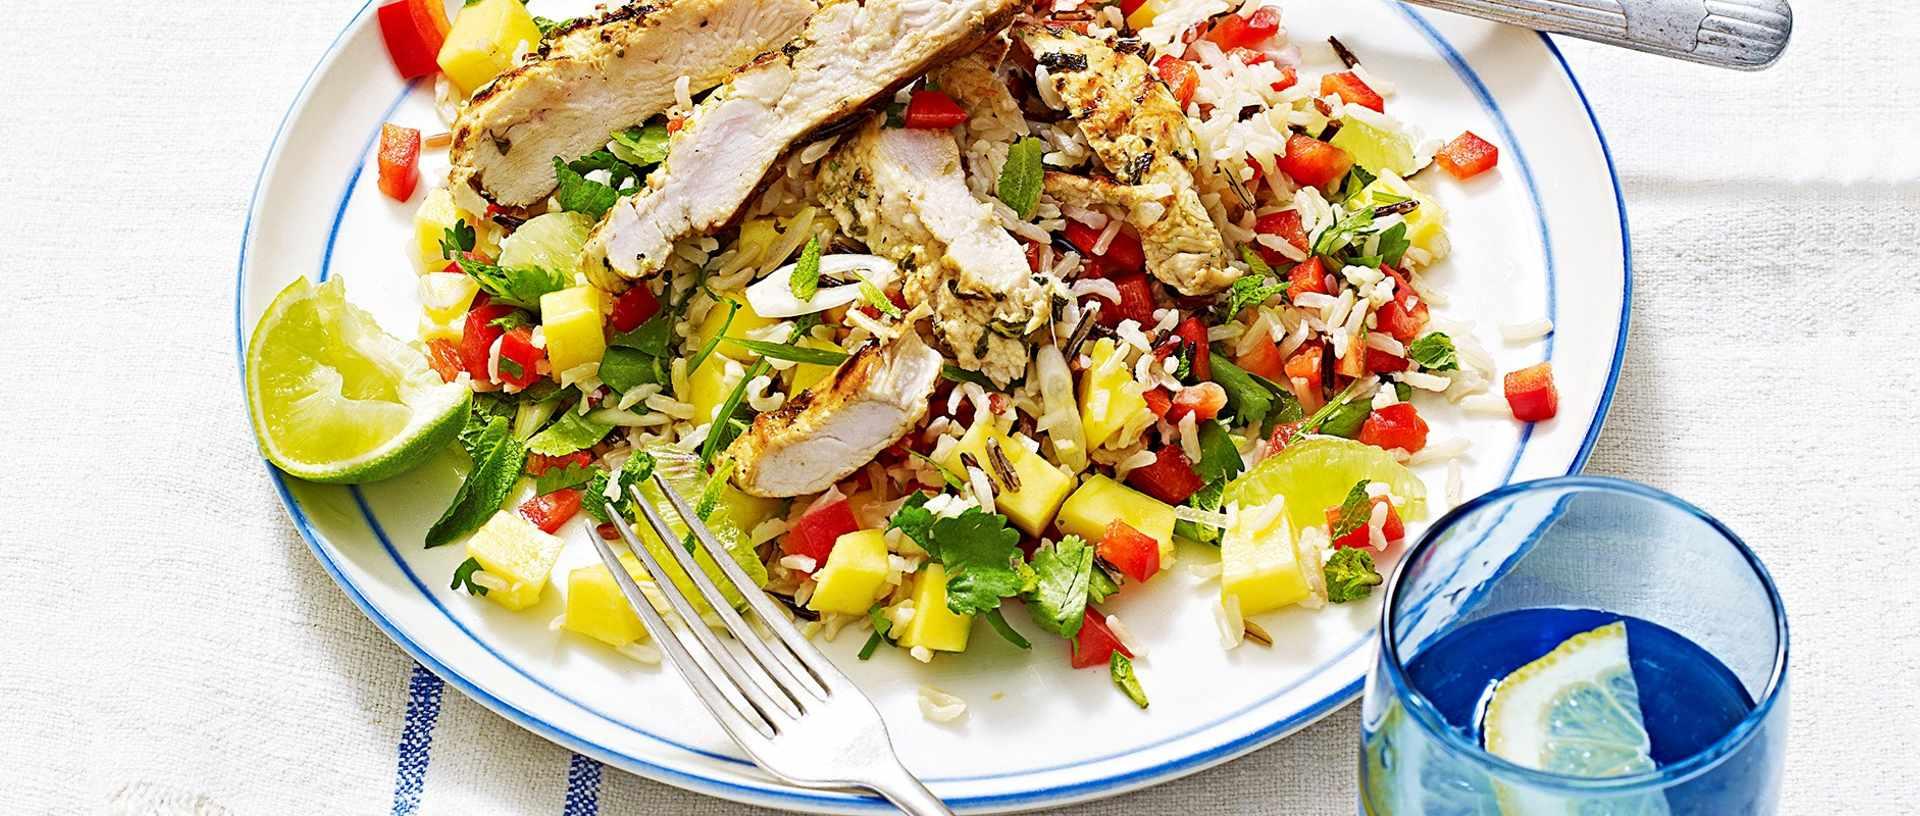 Mojito chicken wild rice salad - healthy chicken recipe